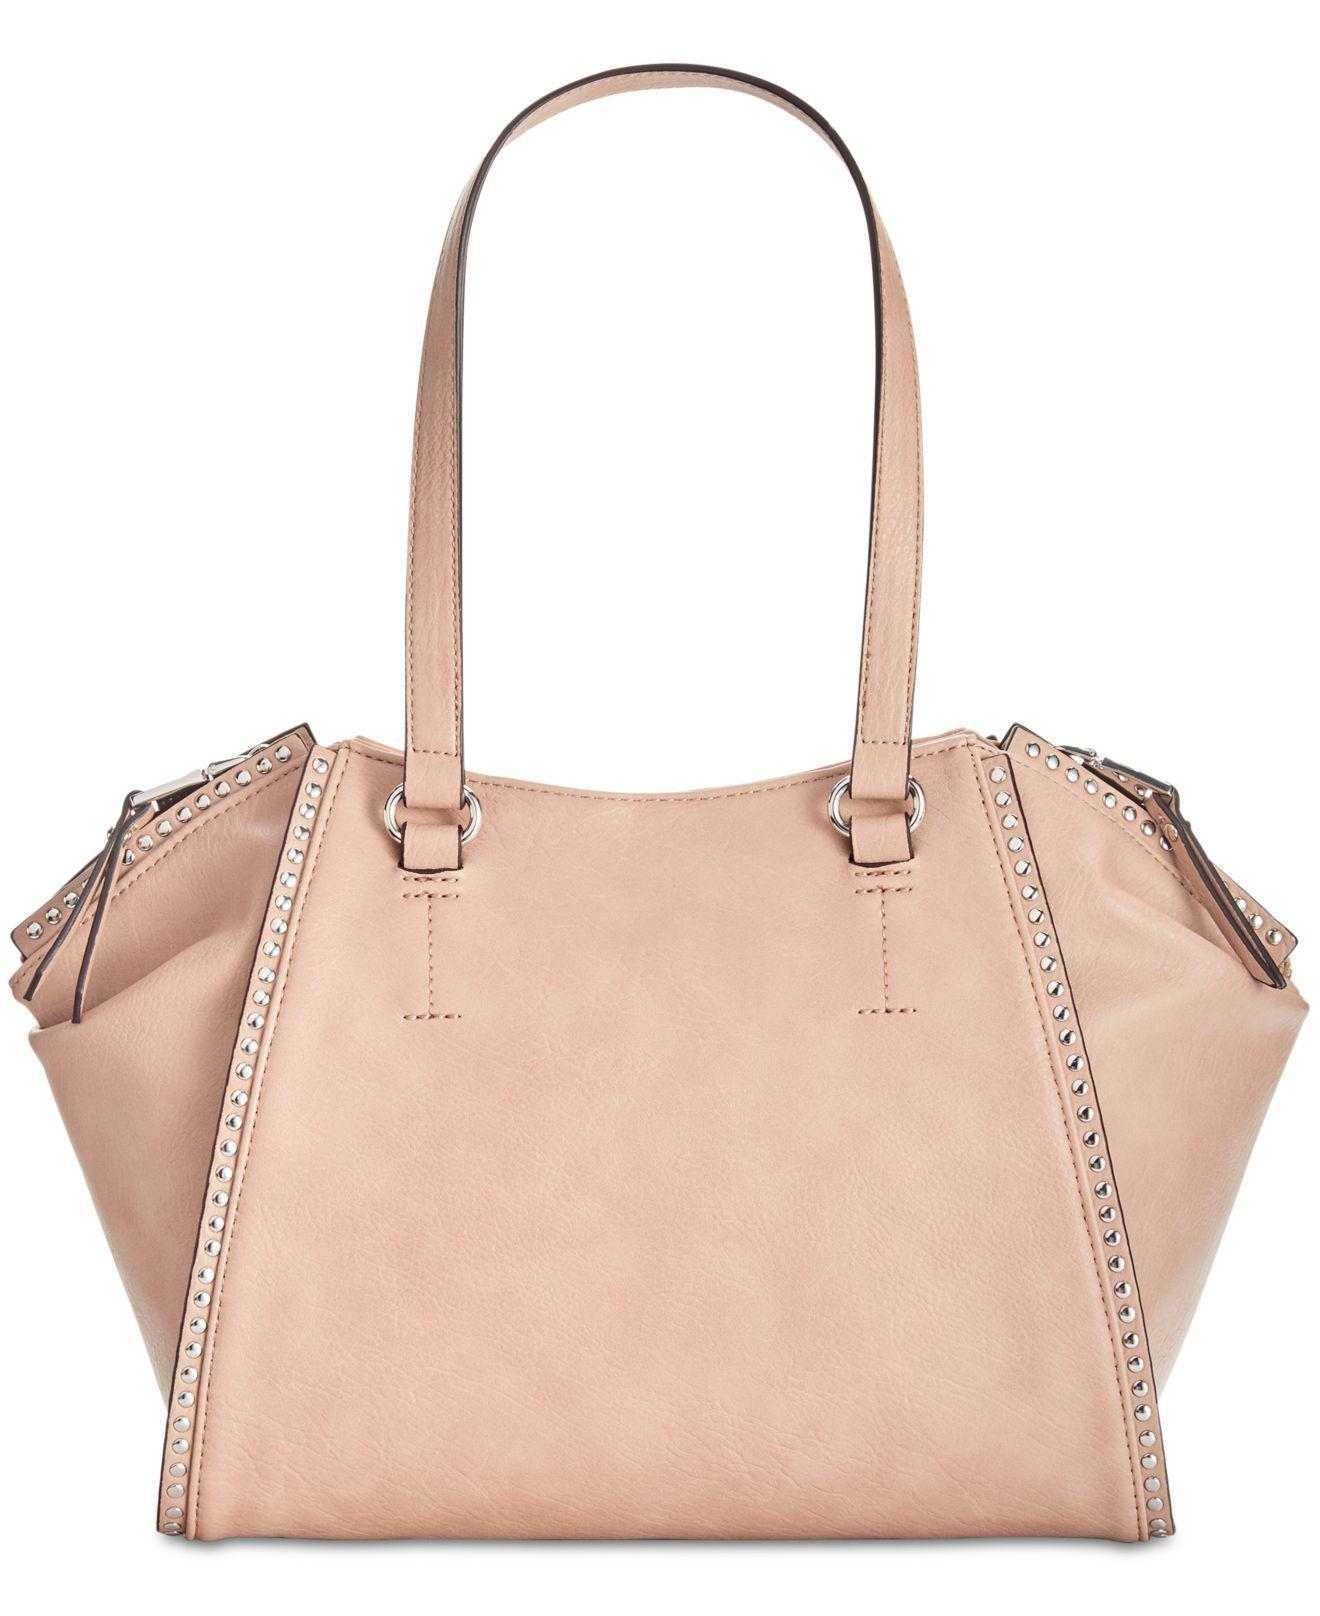 825e9436a353 Lyst - INC International Concepts I.n.c. Hazell Studded Shoulder Bag ...